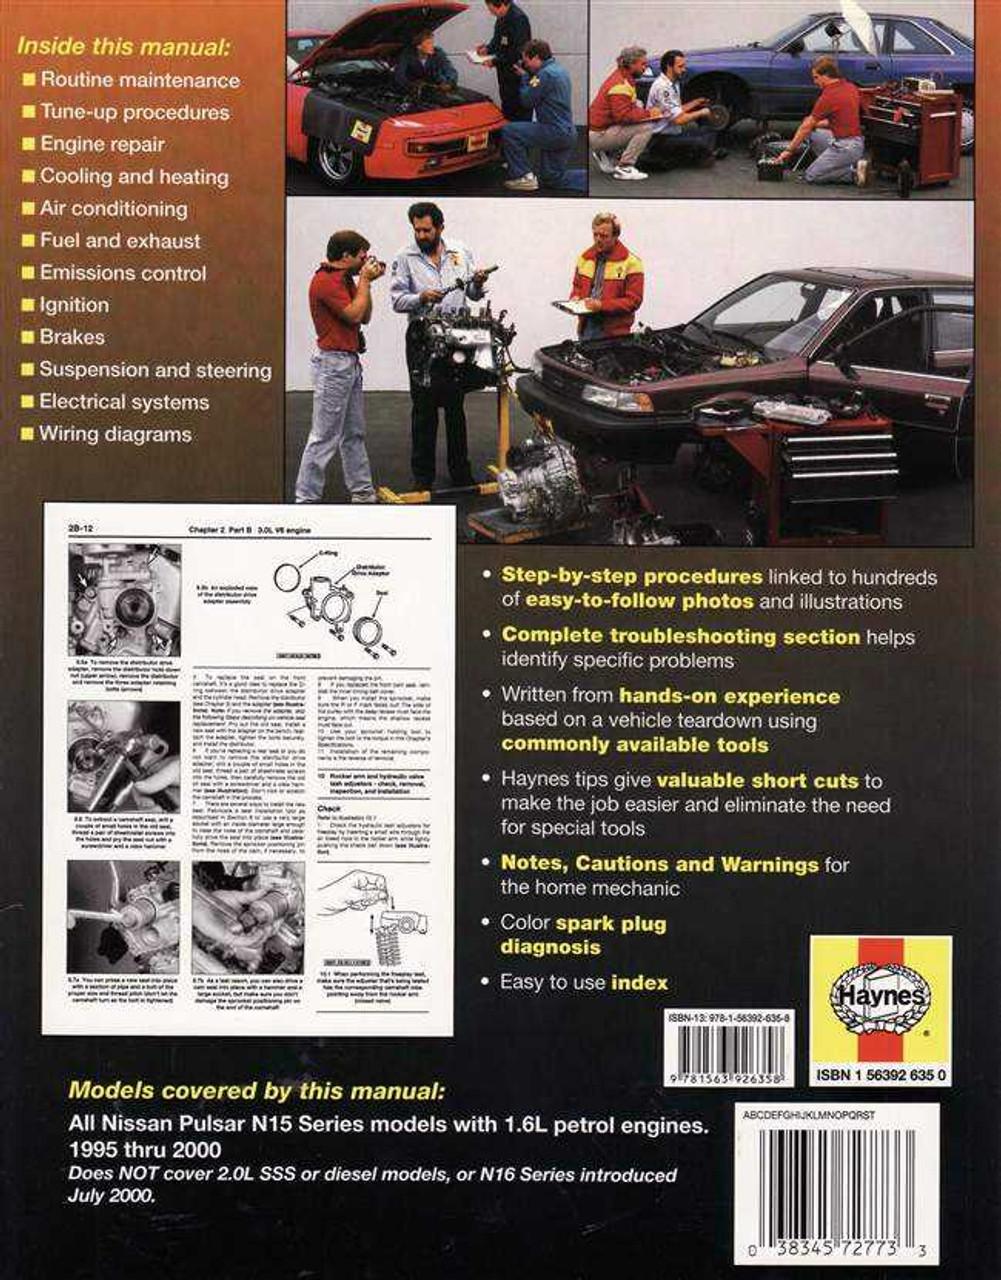 Nissan Pulsar N15 Series  1 6l Petrol Engines 1995